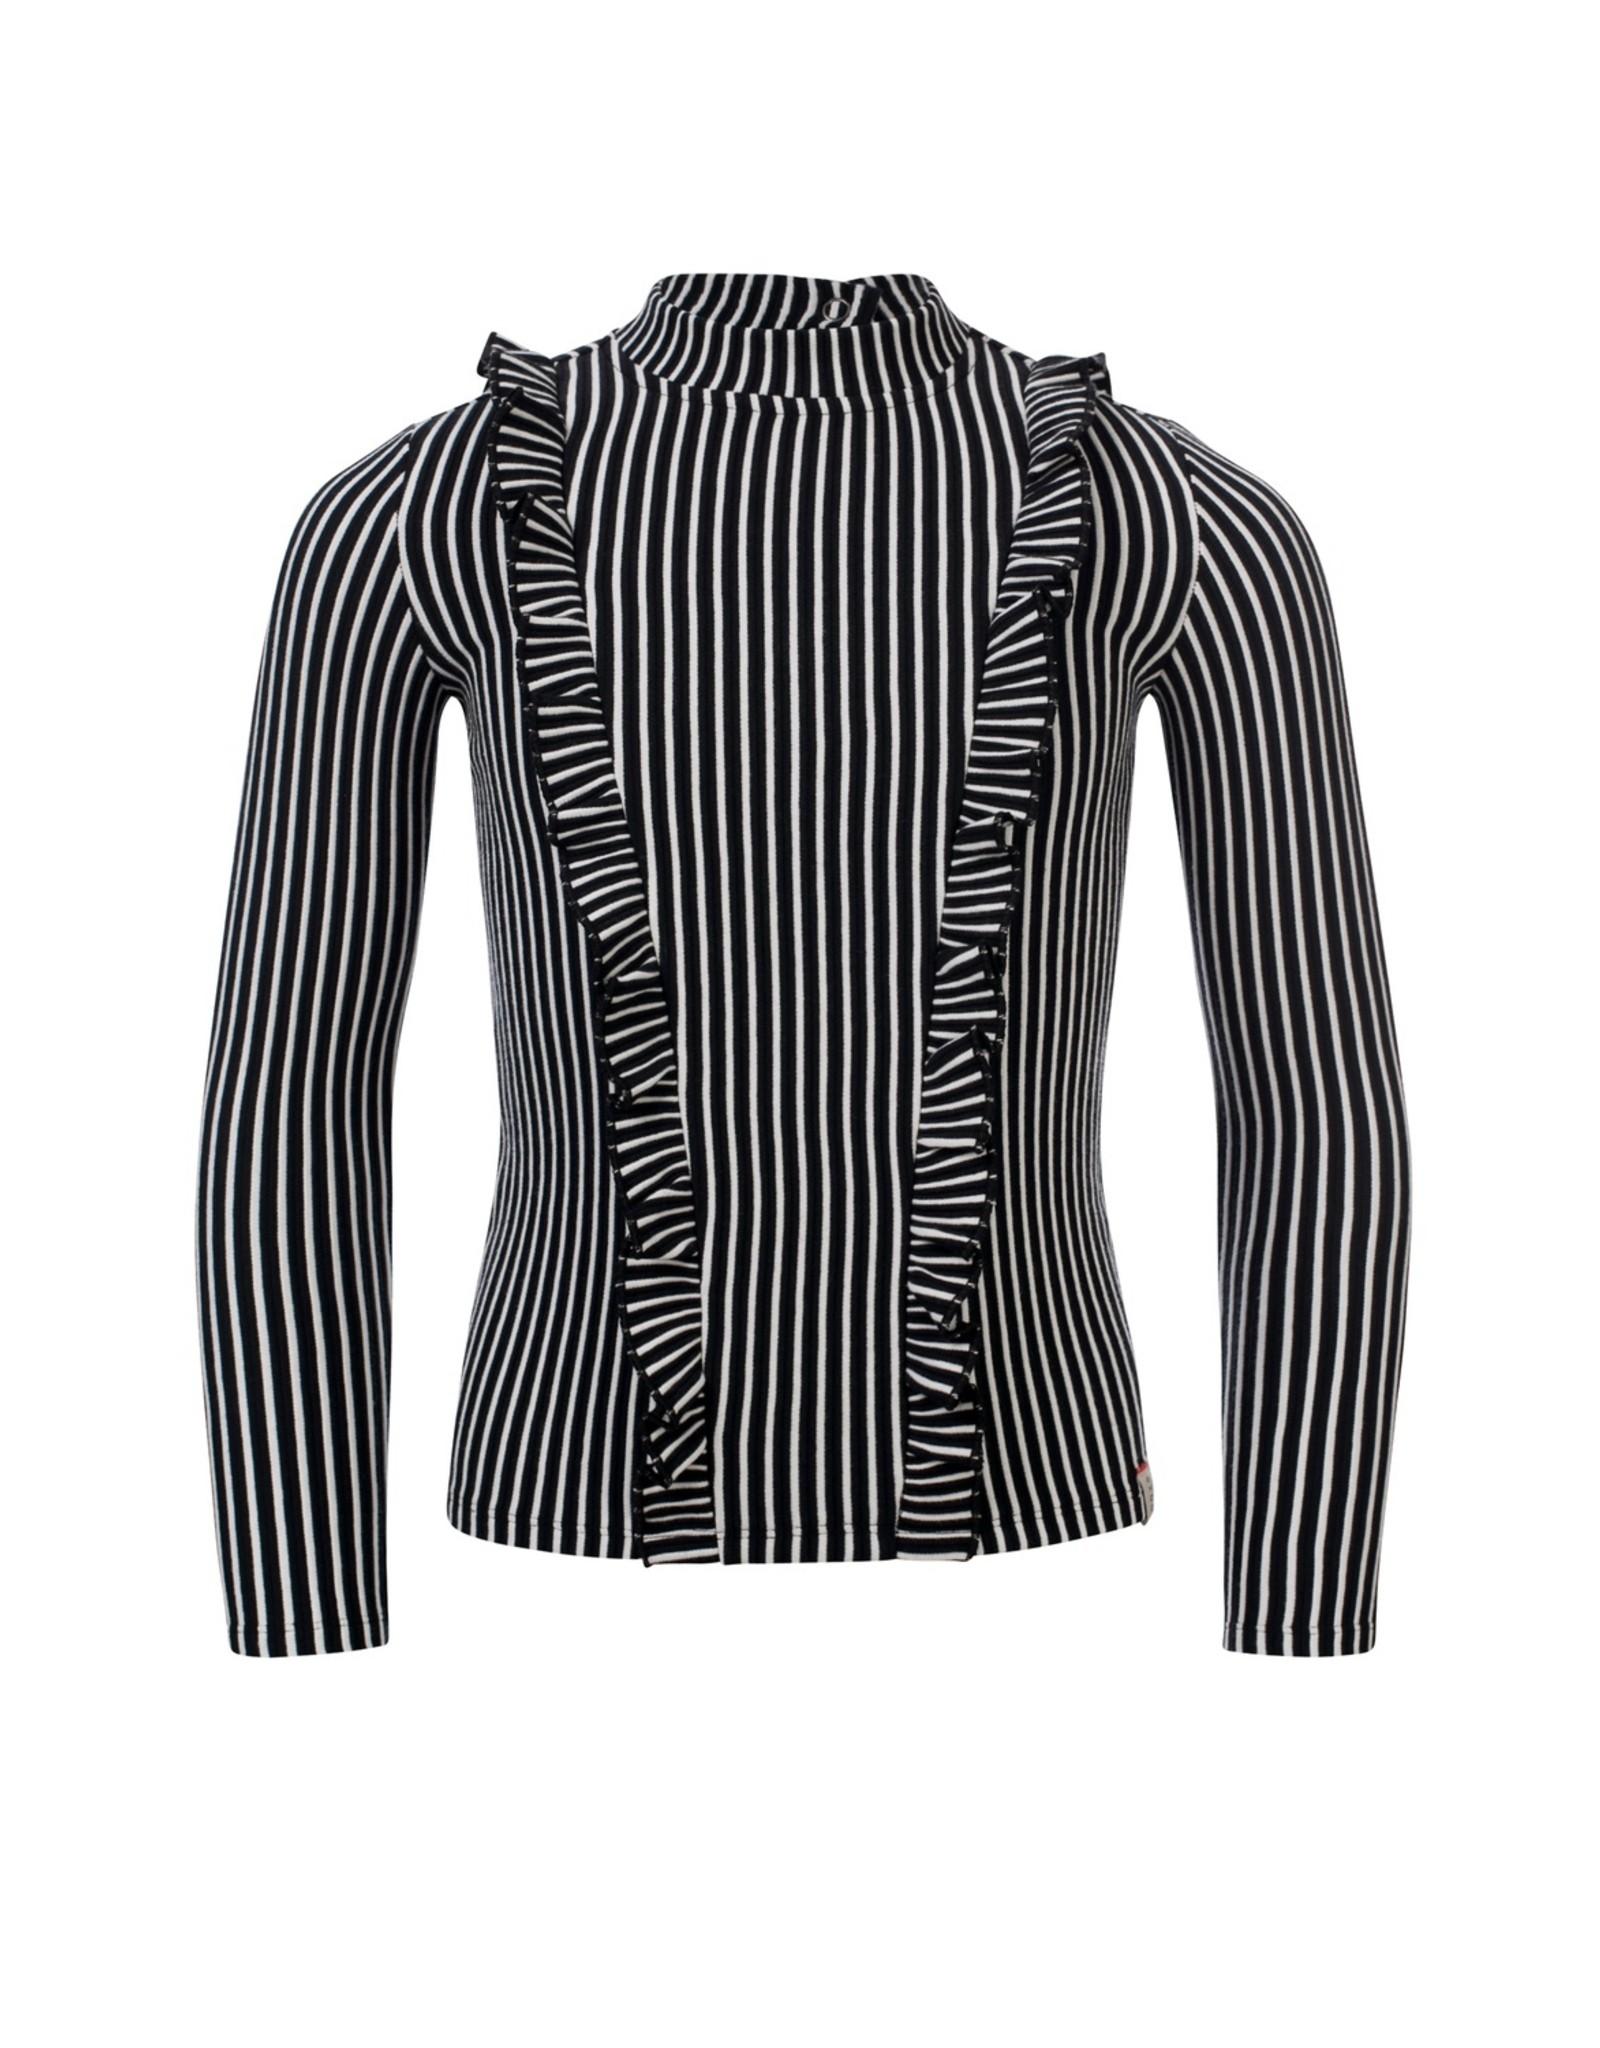 Looxs 10SIXTEEN Girls top stripe c